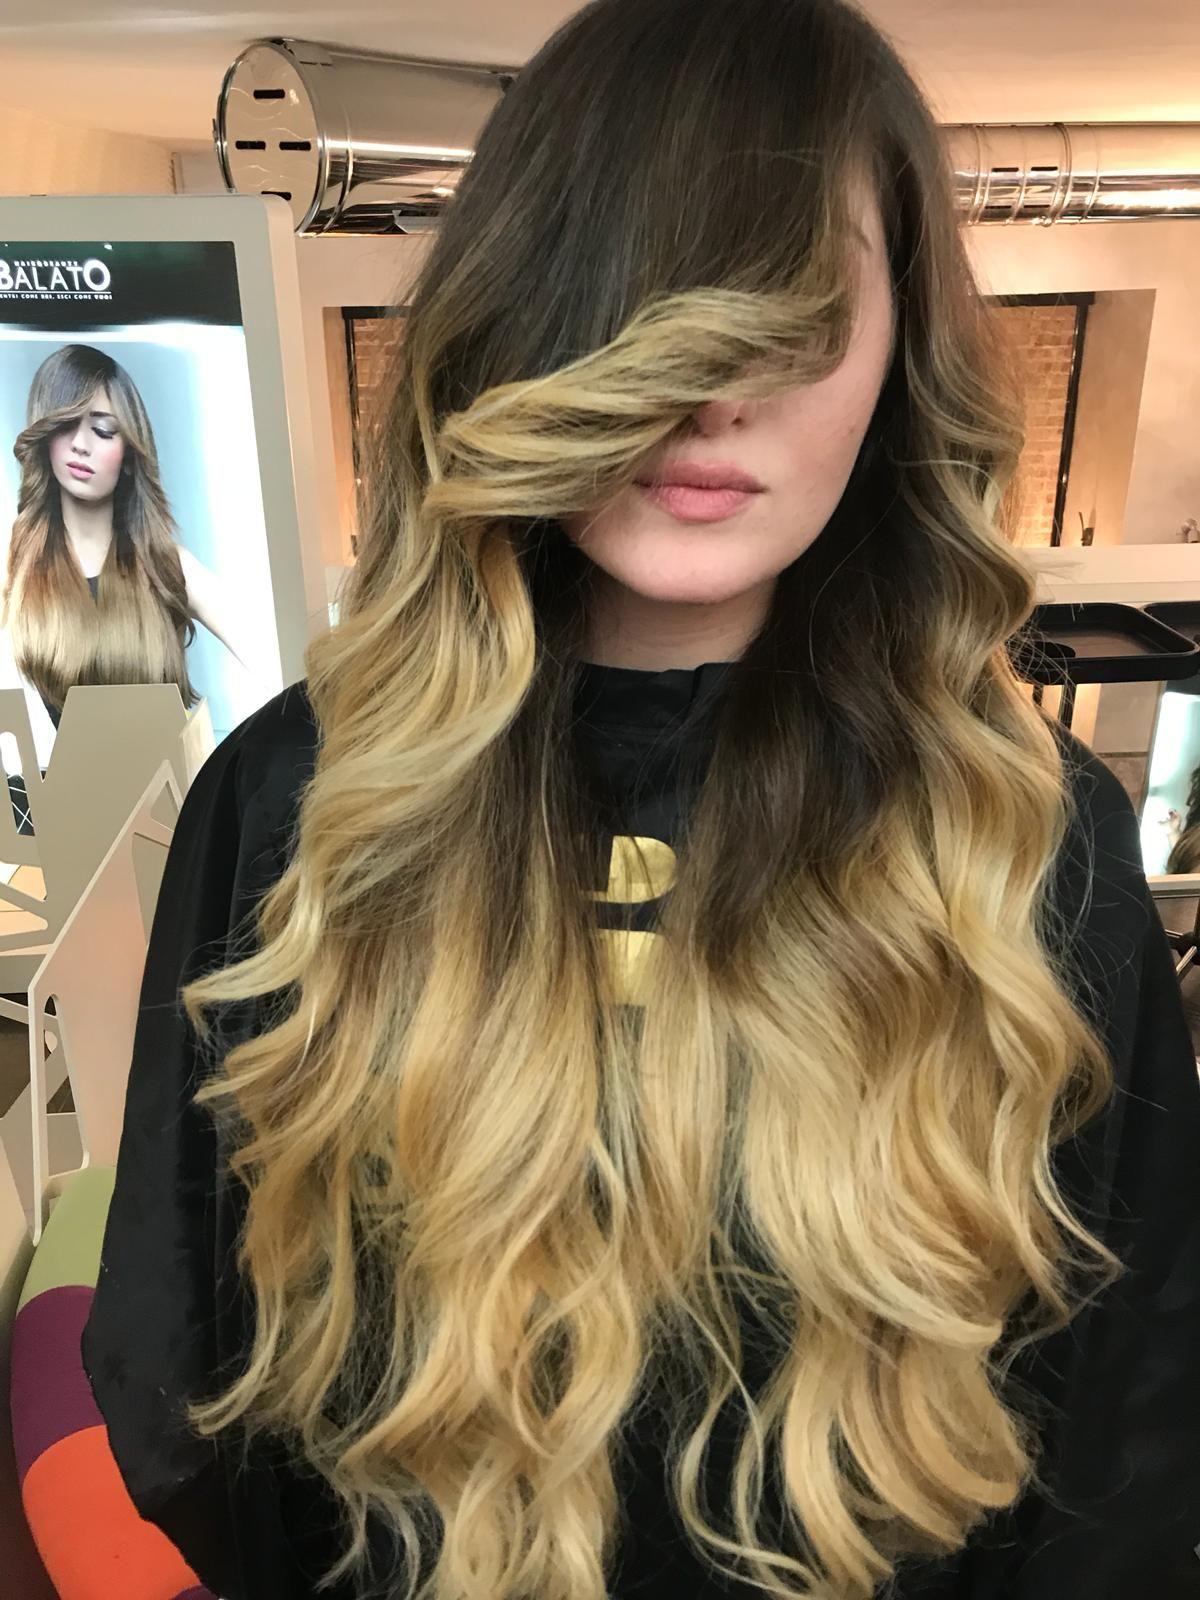 Pin By Balato Hair Makeup On Hair Long Hair Girl Hairstyles With Bangs Hair Styles